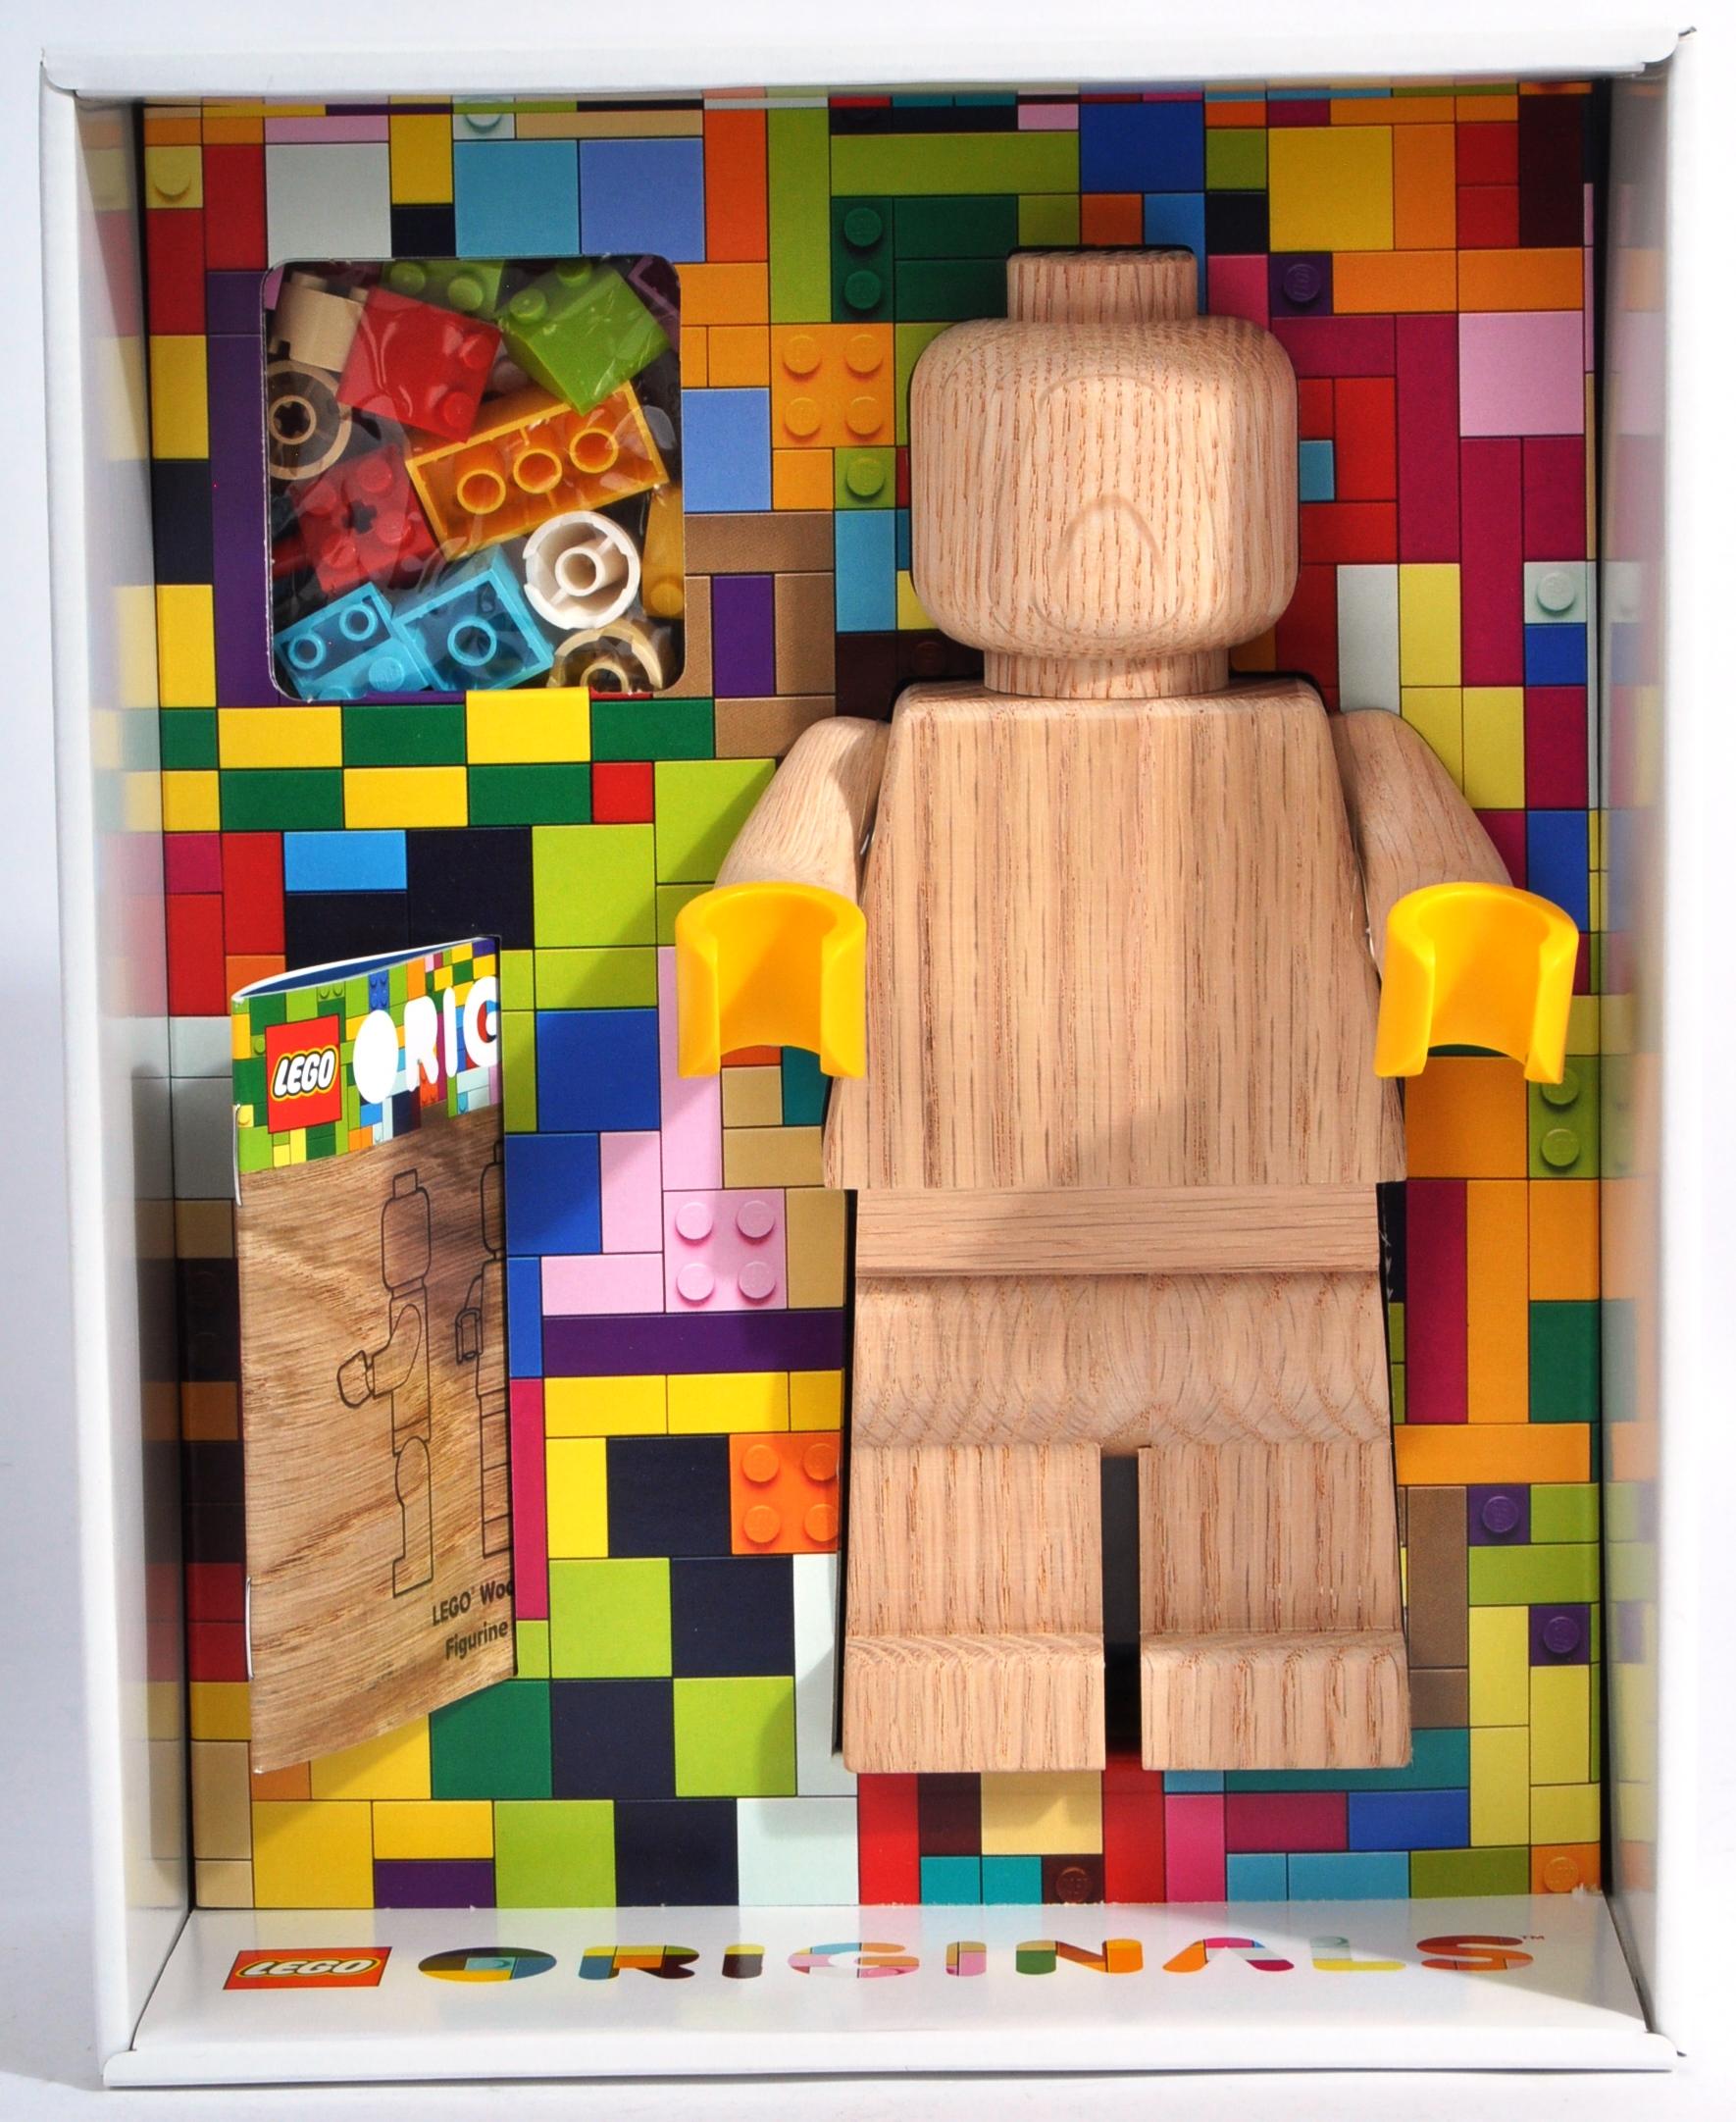 LEGO ORIGINALS - 853967 - WOODEN MINIFIGURE - Image 2 of 5